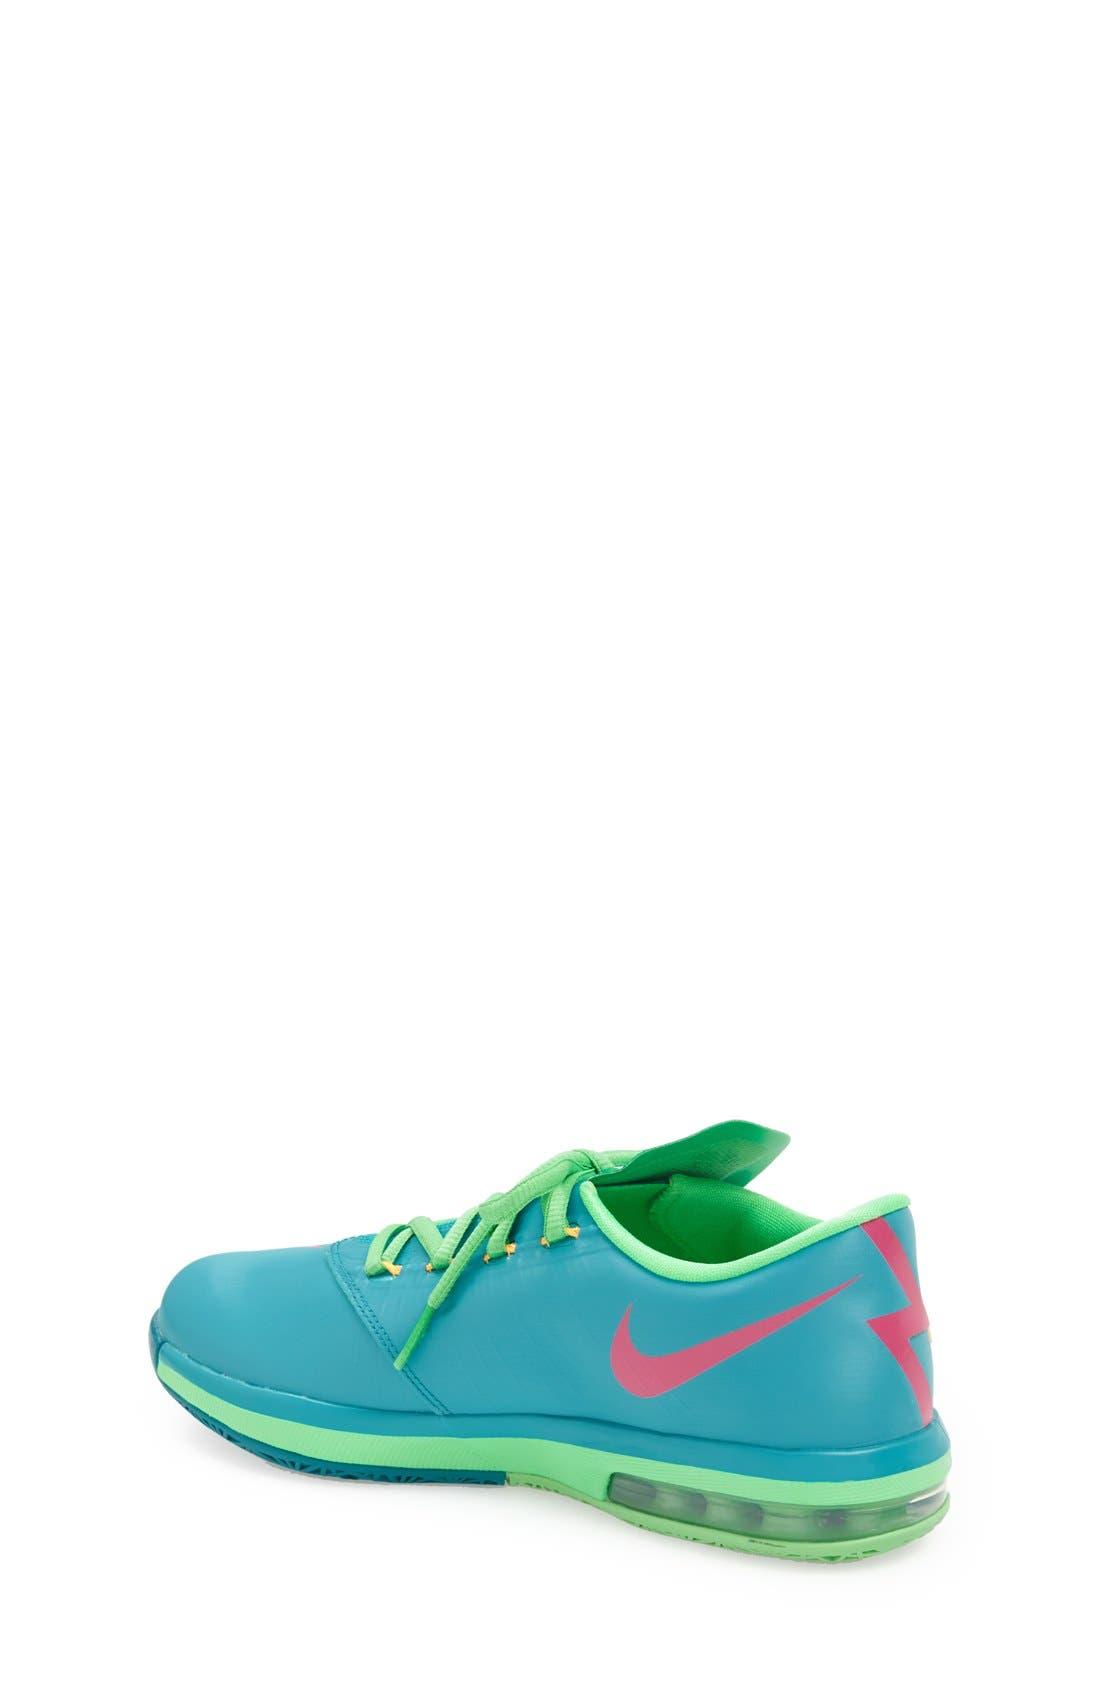 Alternate Image 2  - Nike 'KD VI' Basketball Shoe (Big Kid)